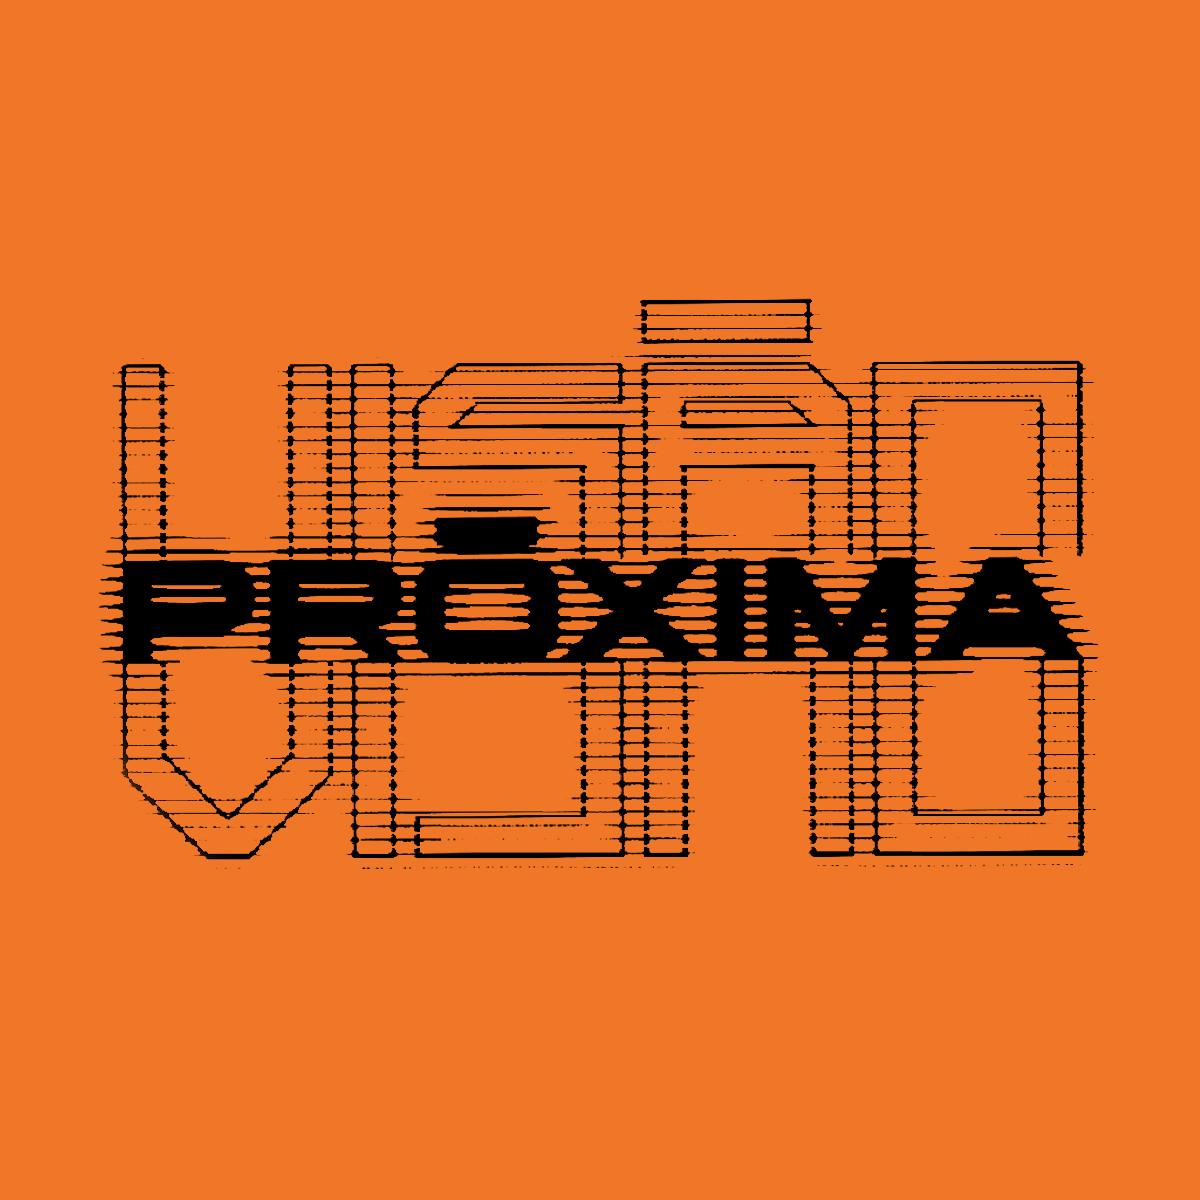 Próxima Visão (proximavisao) Profile Image | Linktree